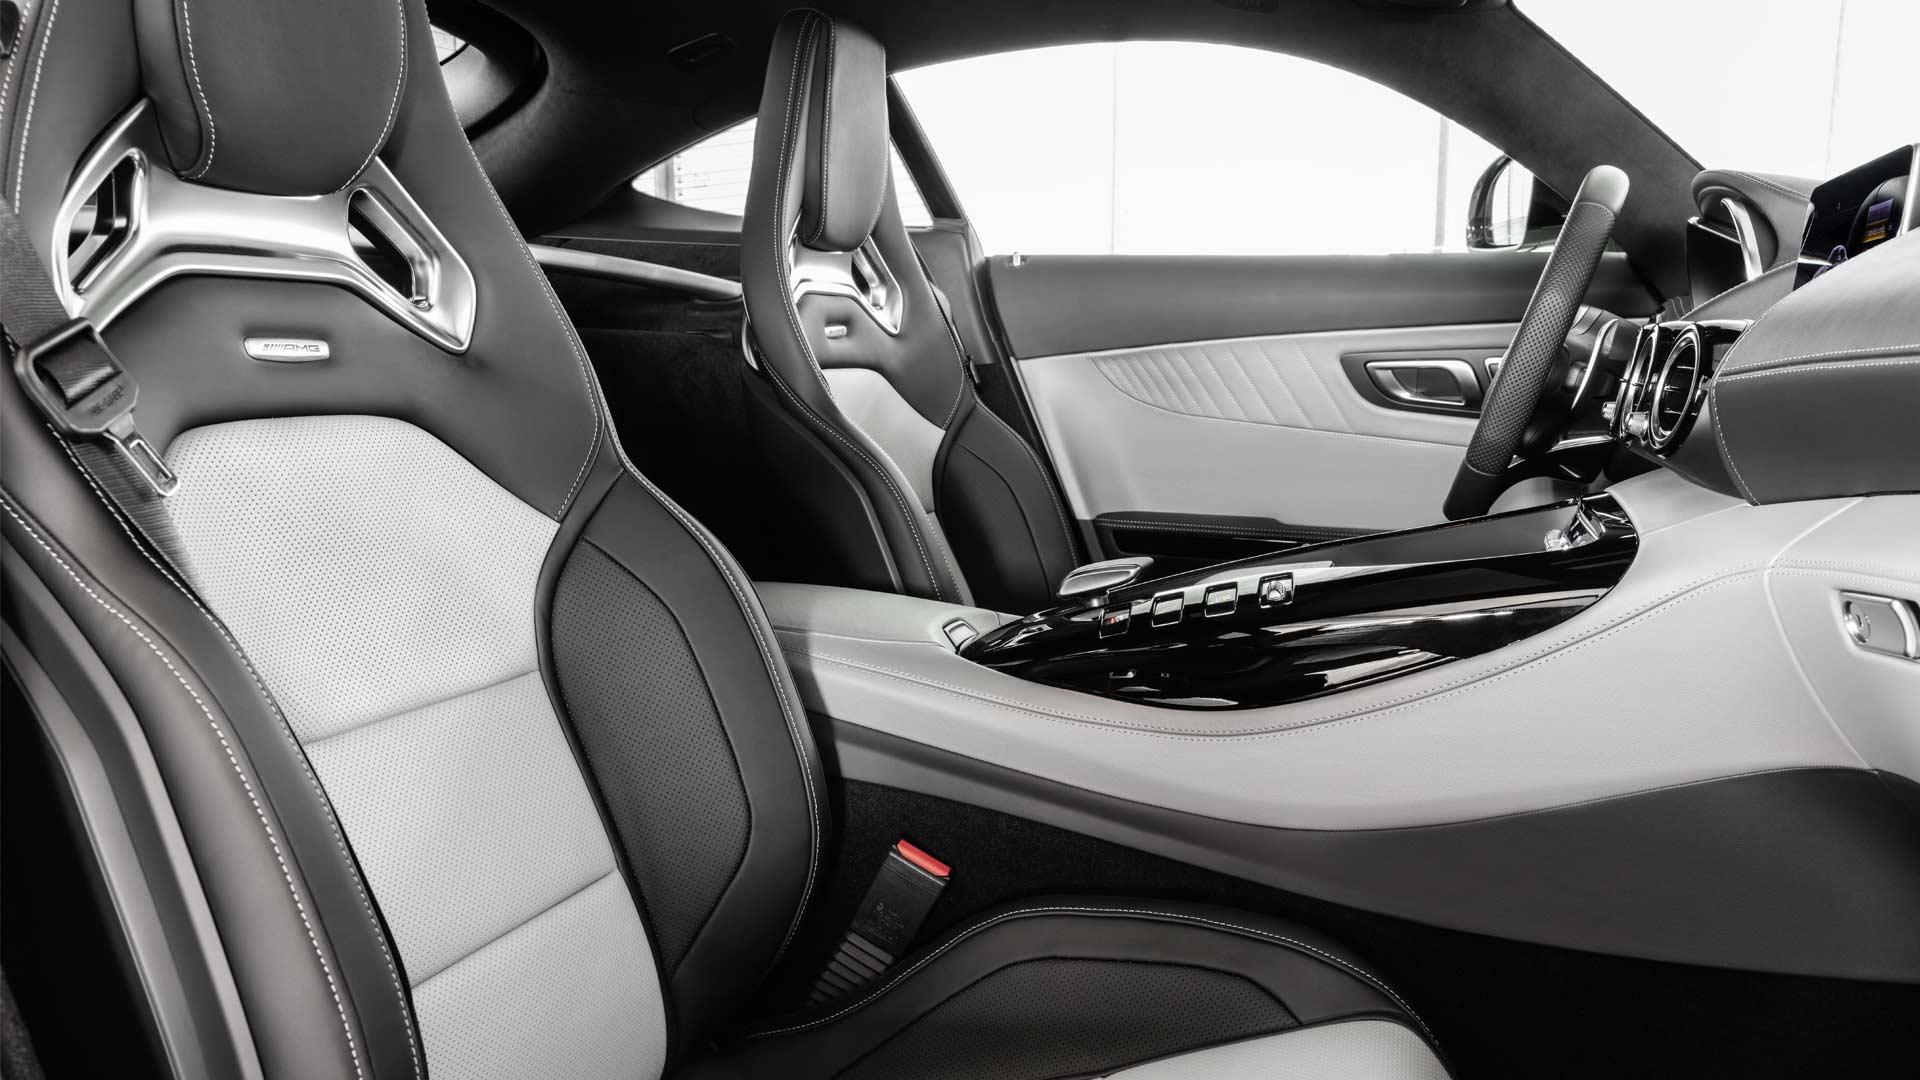 2019-Mercedes-AMG-GT-Interior-designo-diamond-white_2